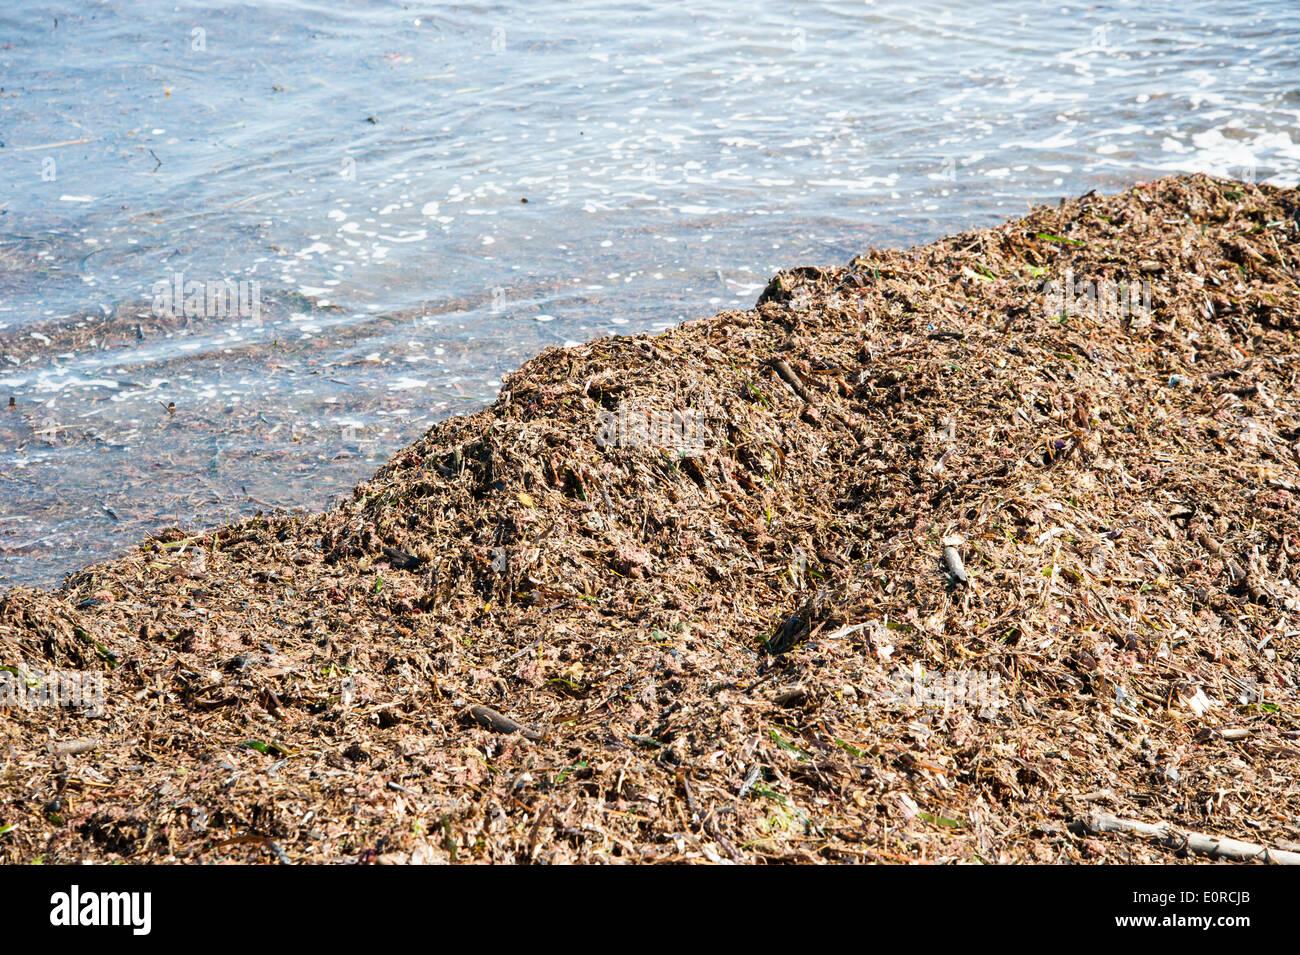 algae on the beach - Stock Image